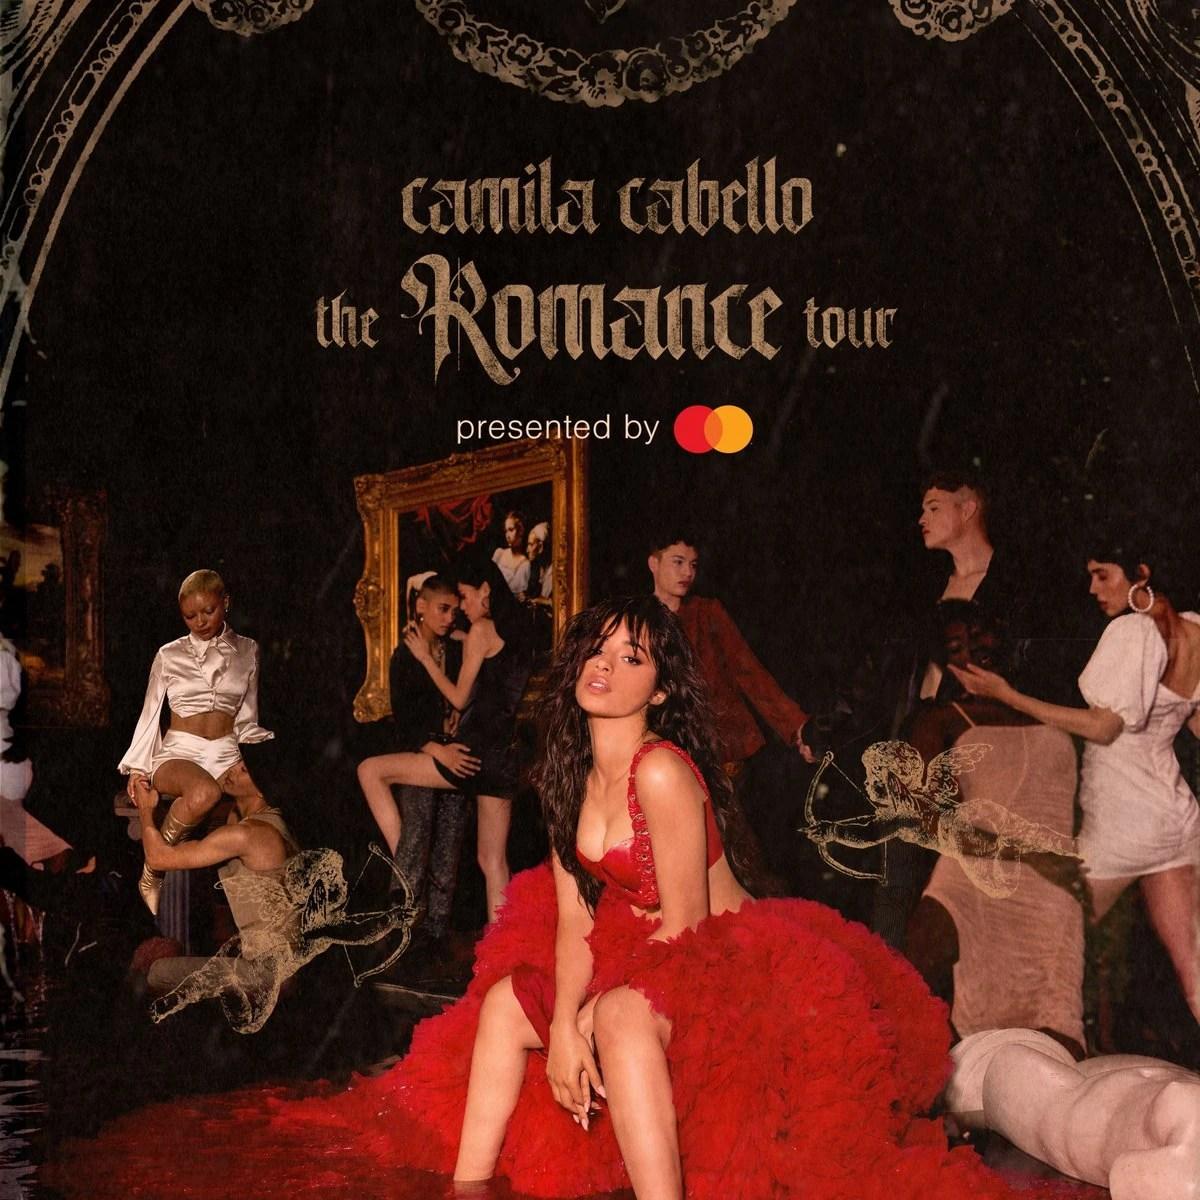 the romance tour camila cabello wiki